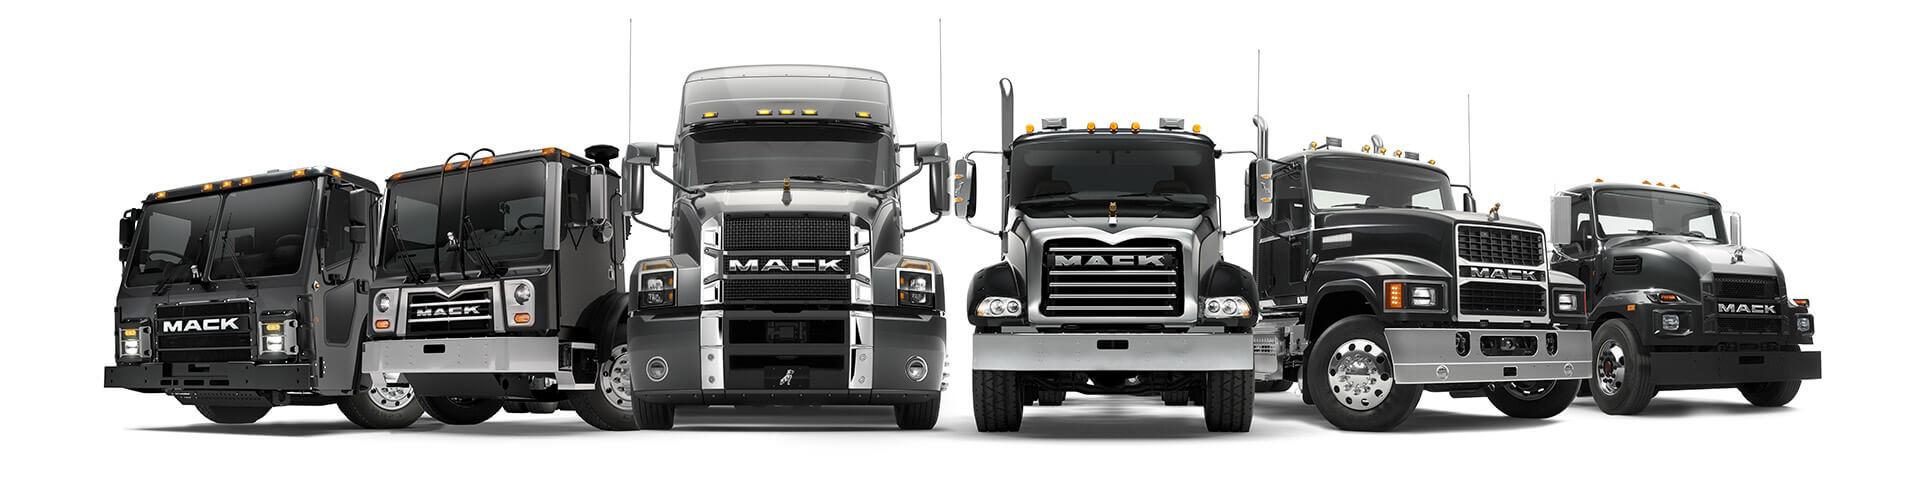 2021 Mack Lineup